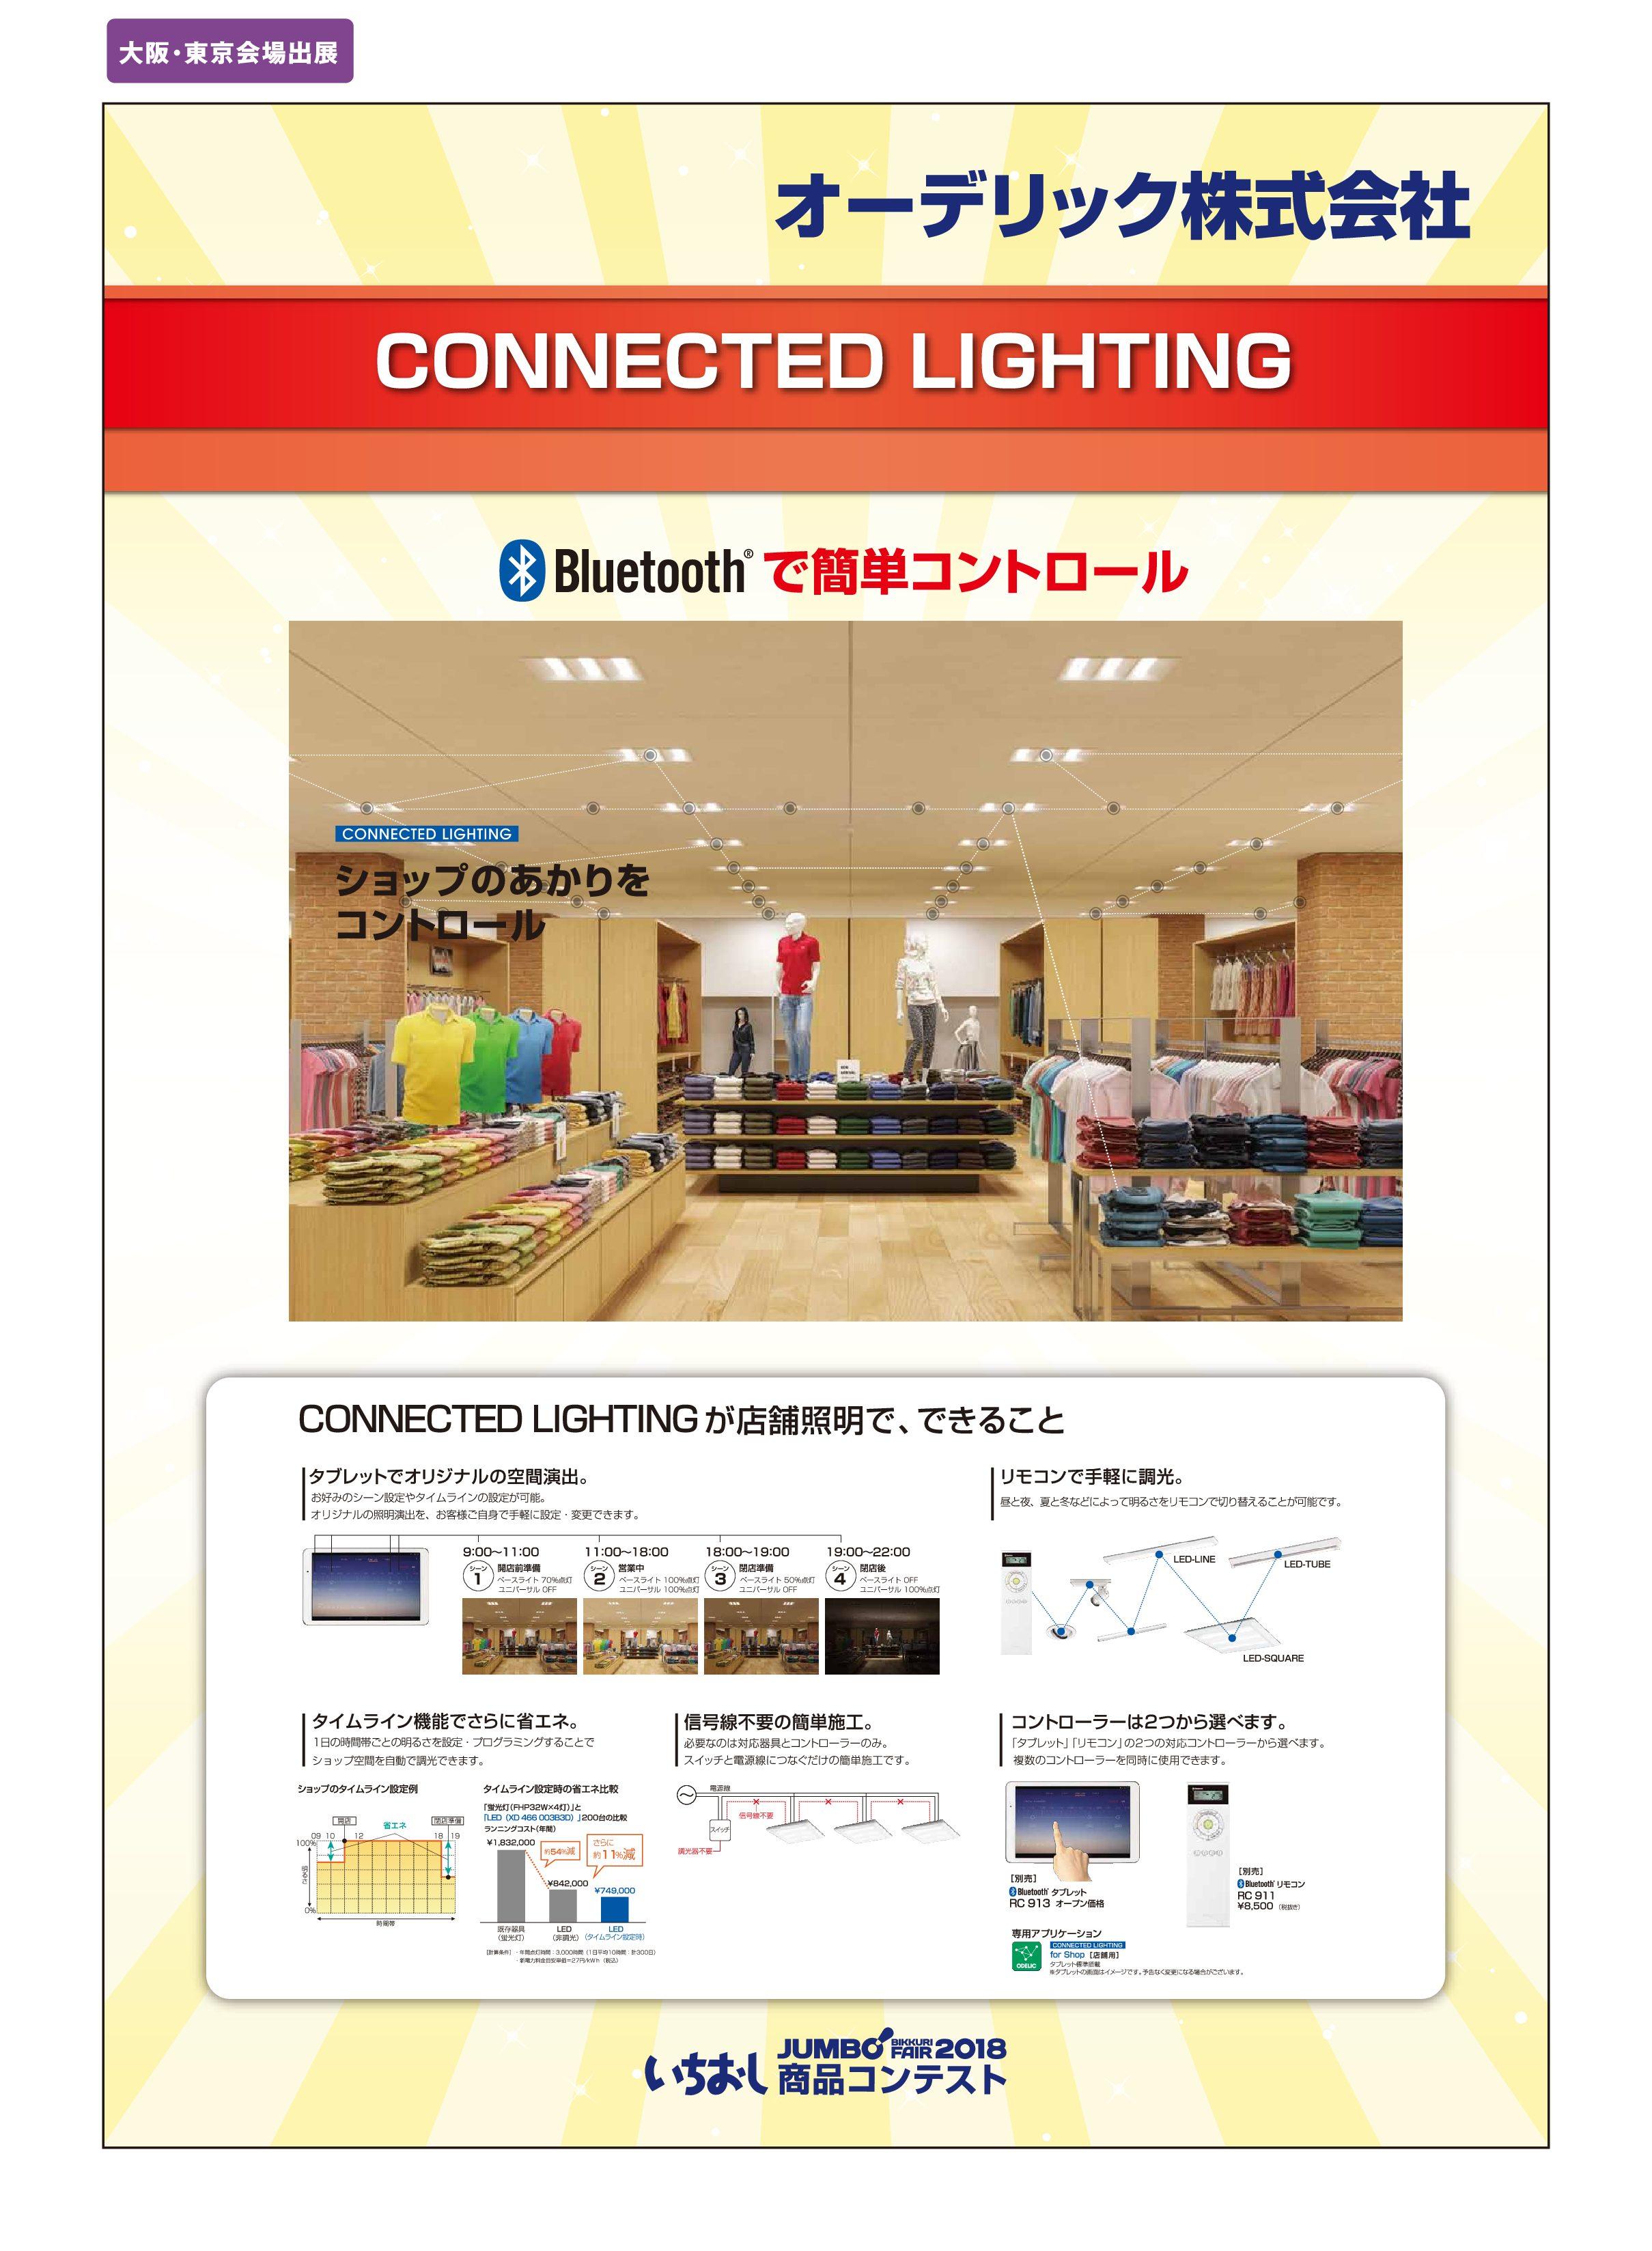 「CONNECTED LIGHTING」オーデリック株式会社の画像